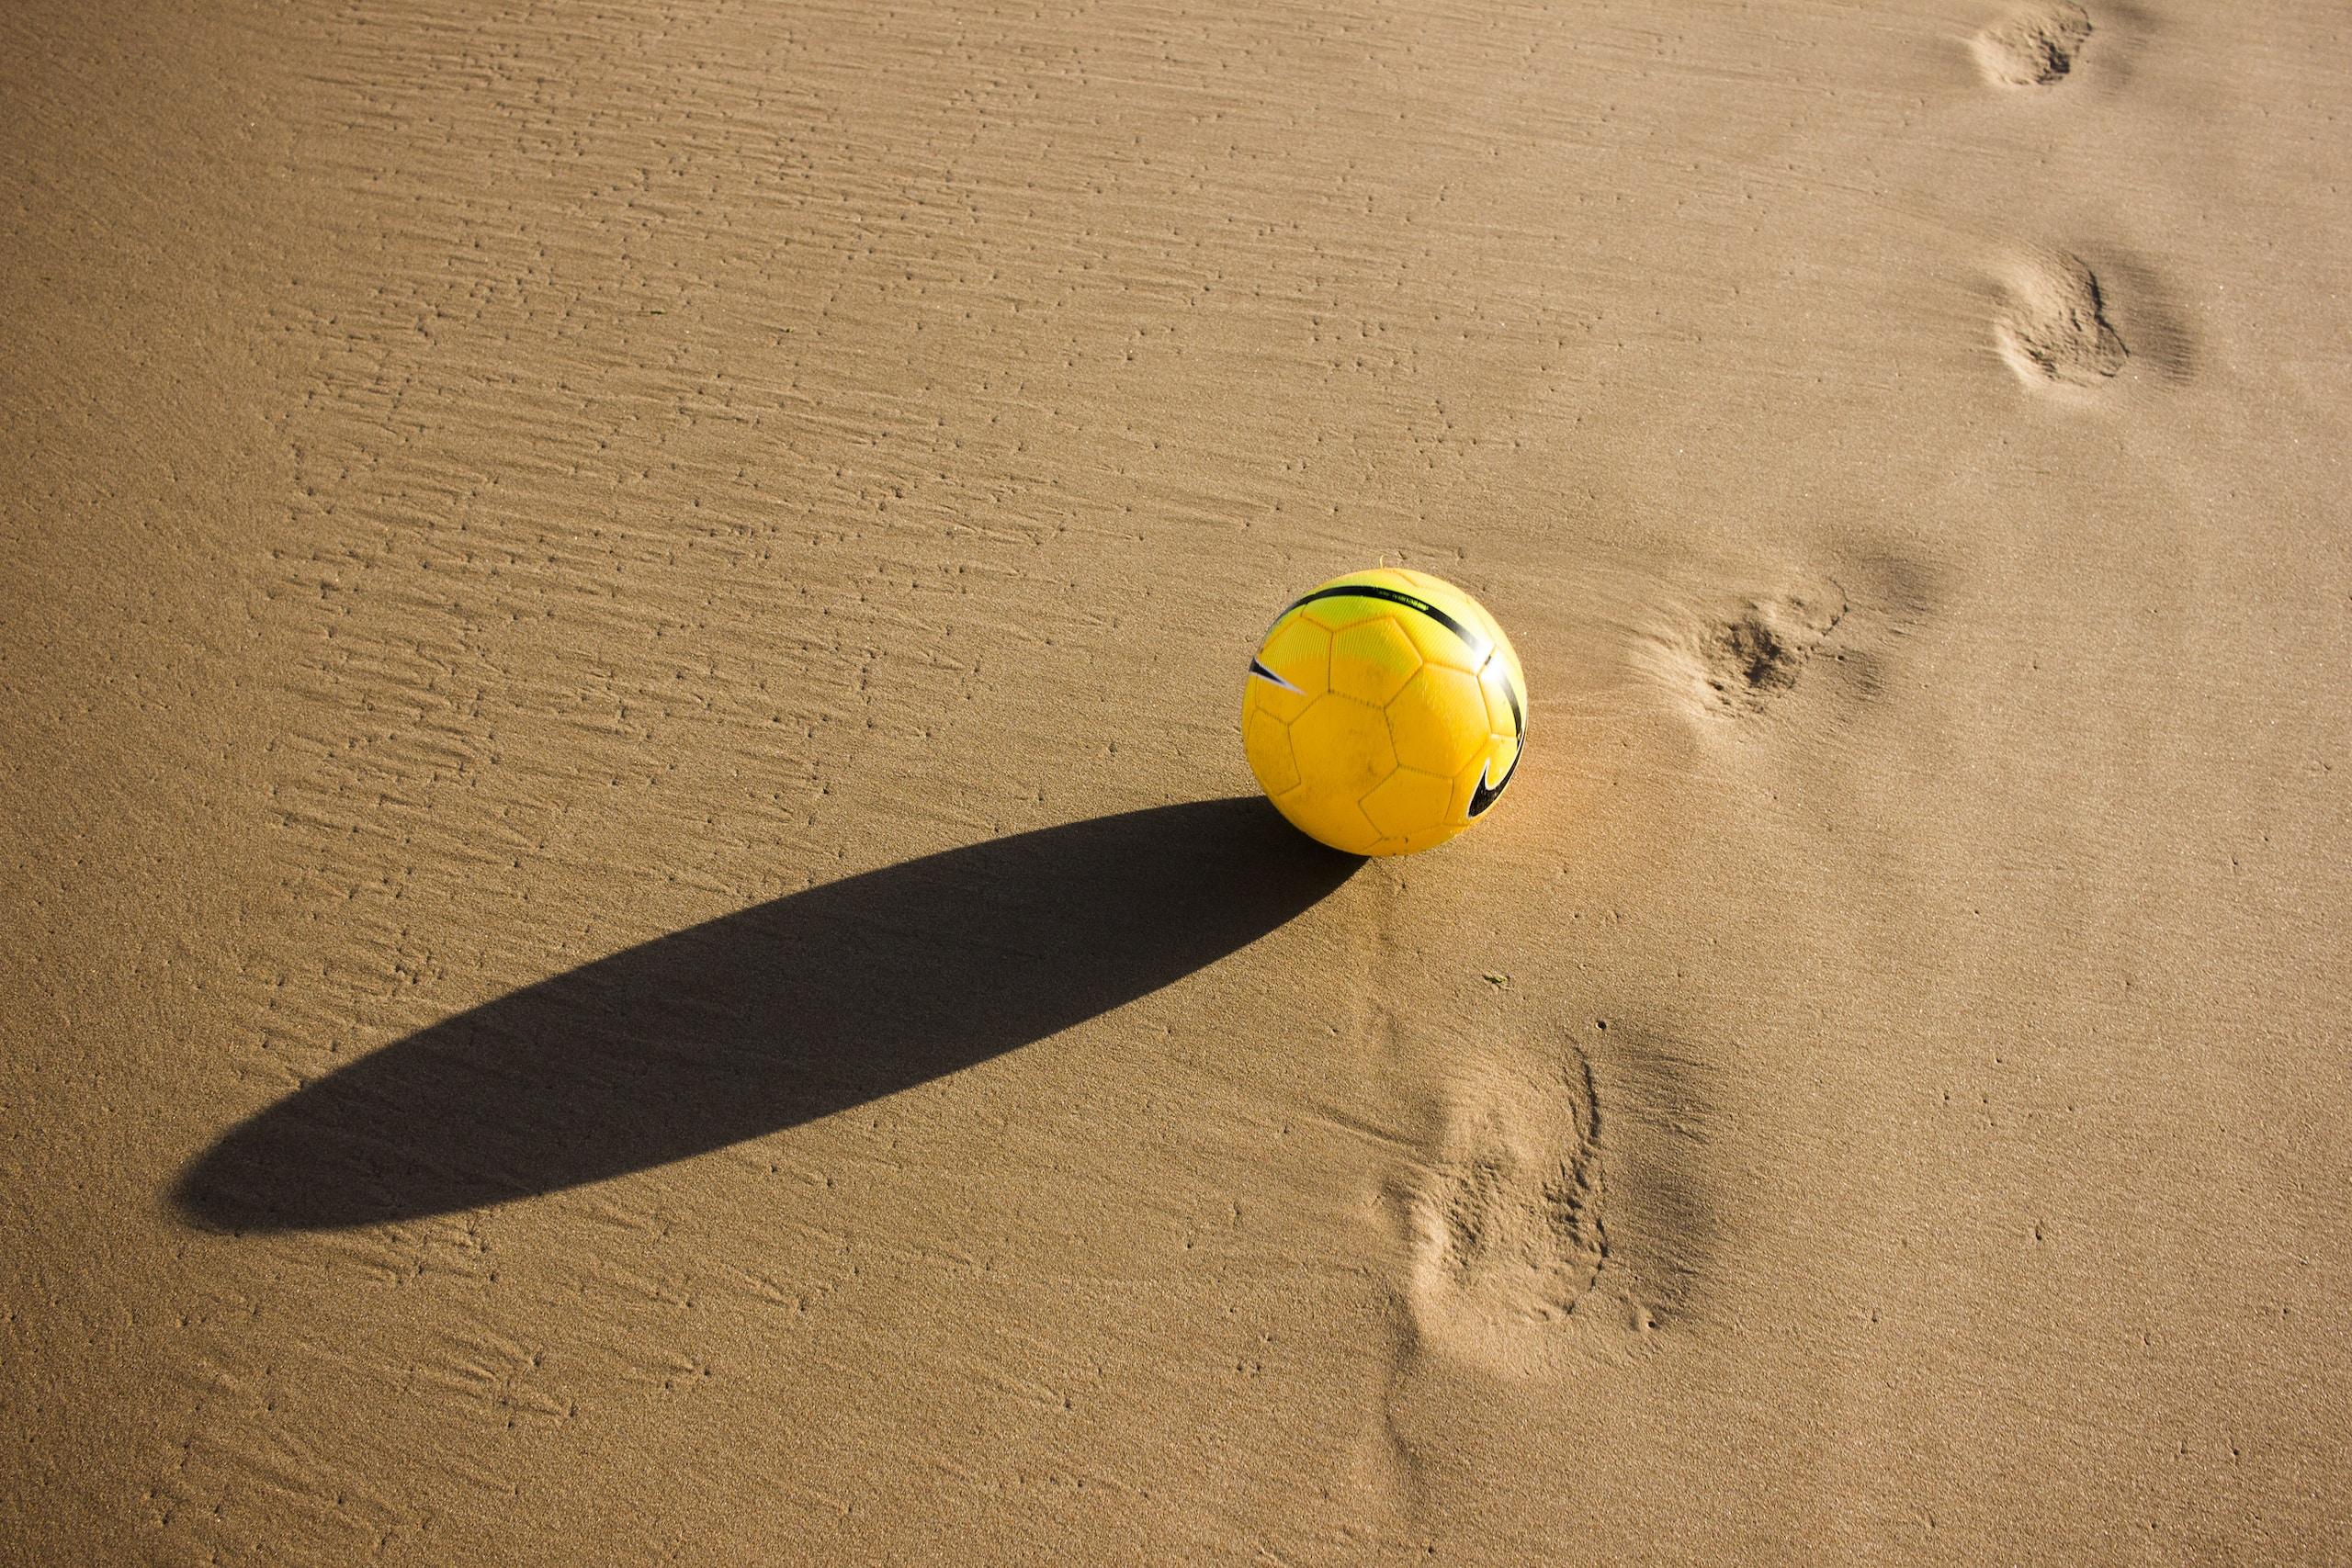 yellow and green soccer ball on desert